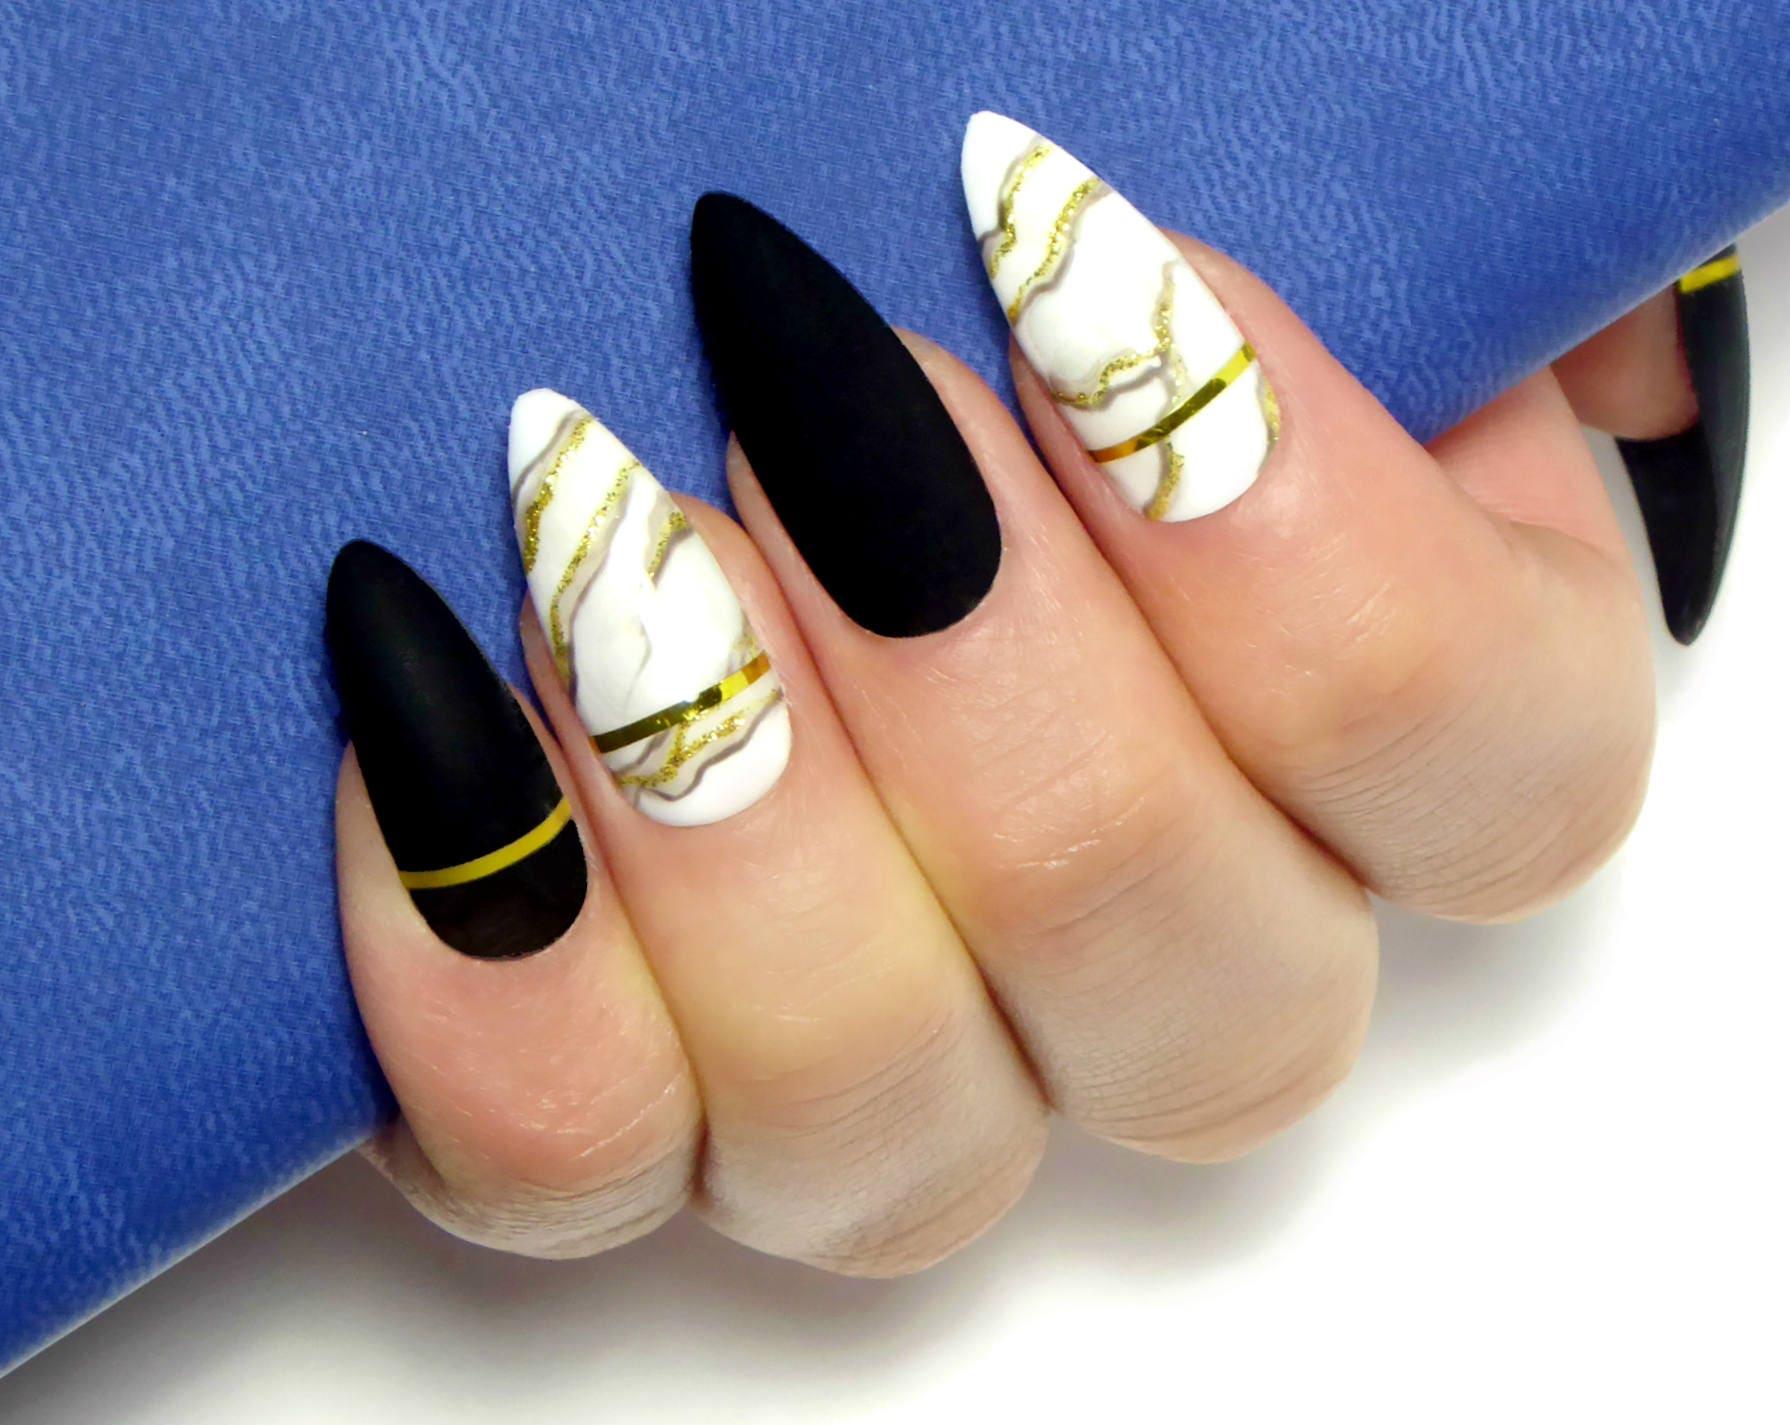 Marmor-Luxus Nägel / falsche Nägel Presse auf falsche Nägel